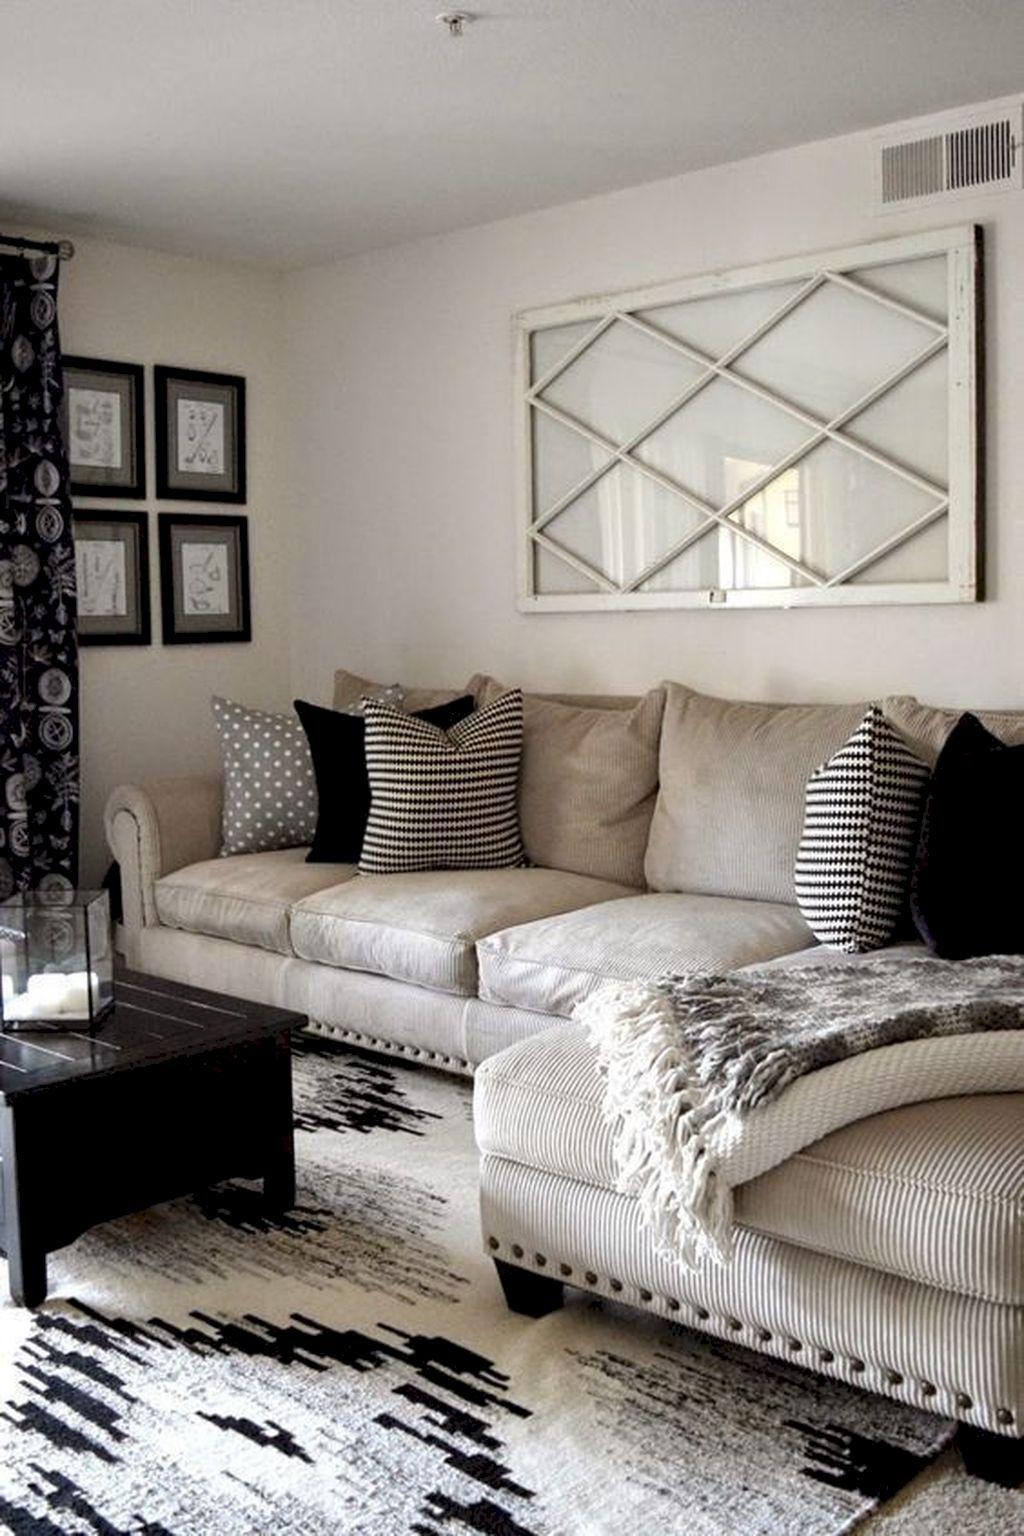 Adorable 85 Small Apartment Living Room Decor Ideas Https://decorapatio.com/